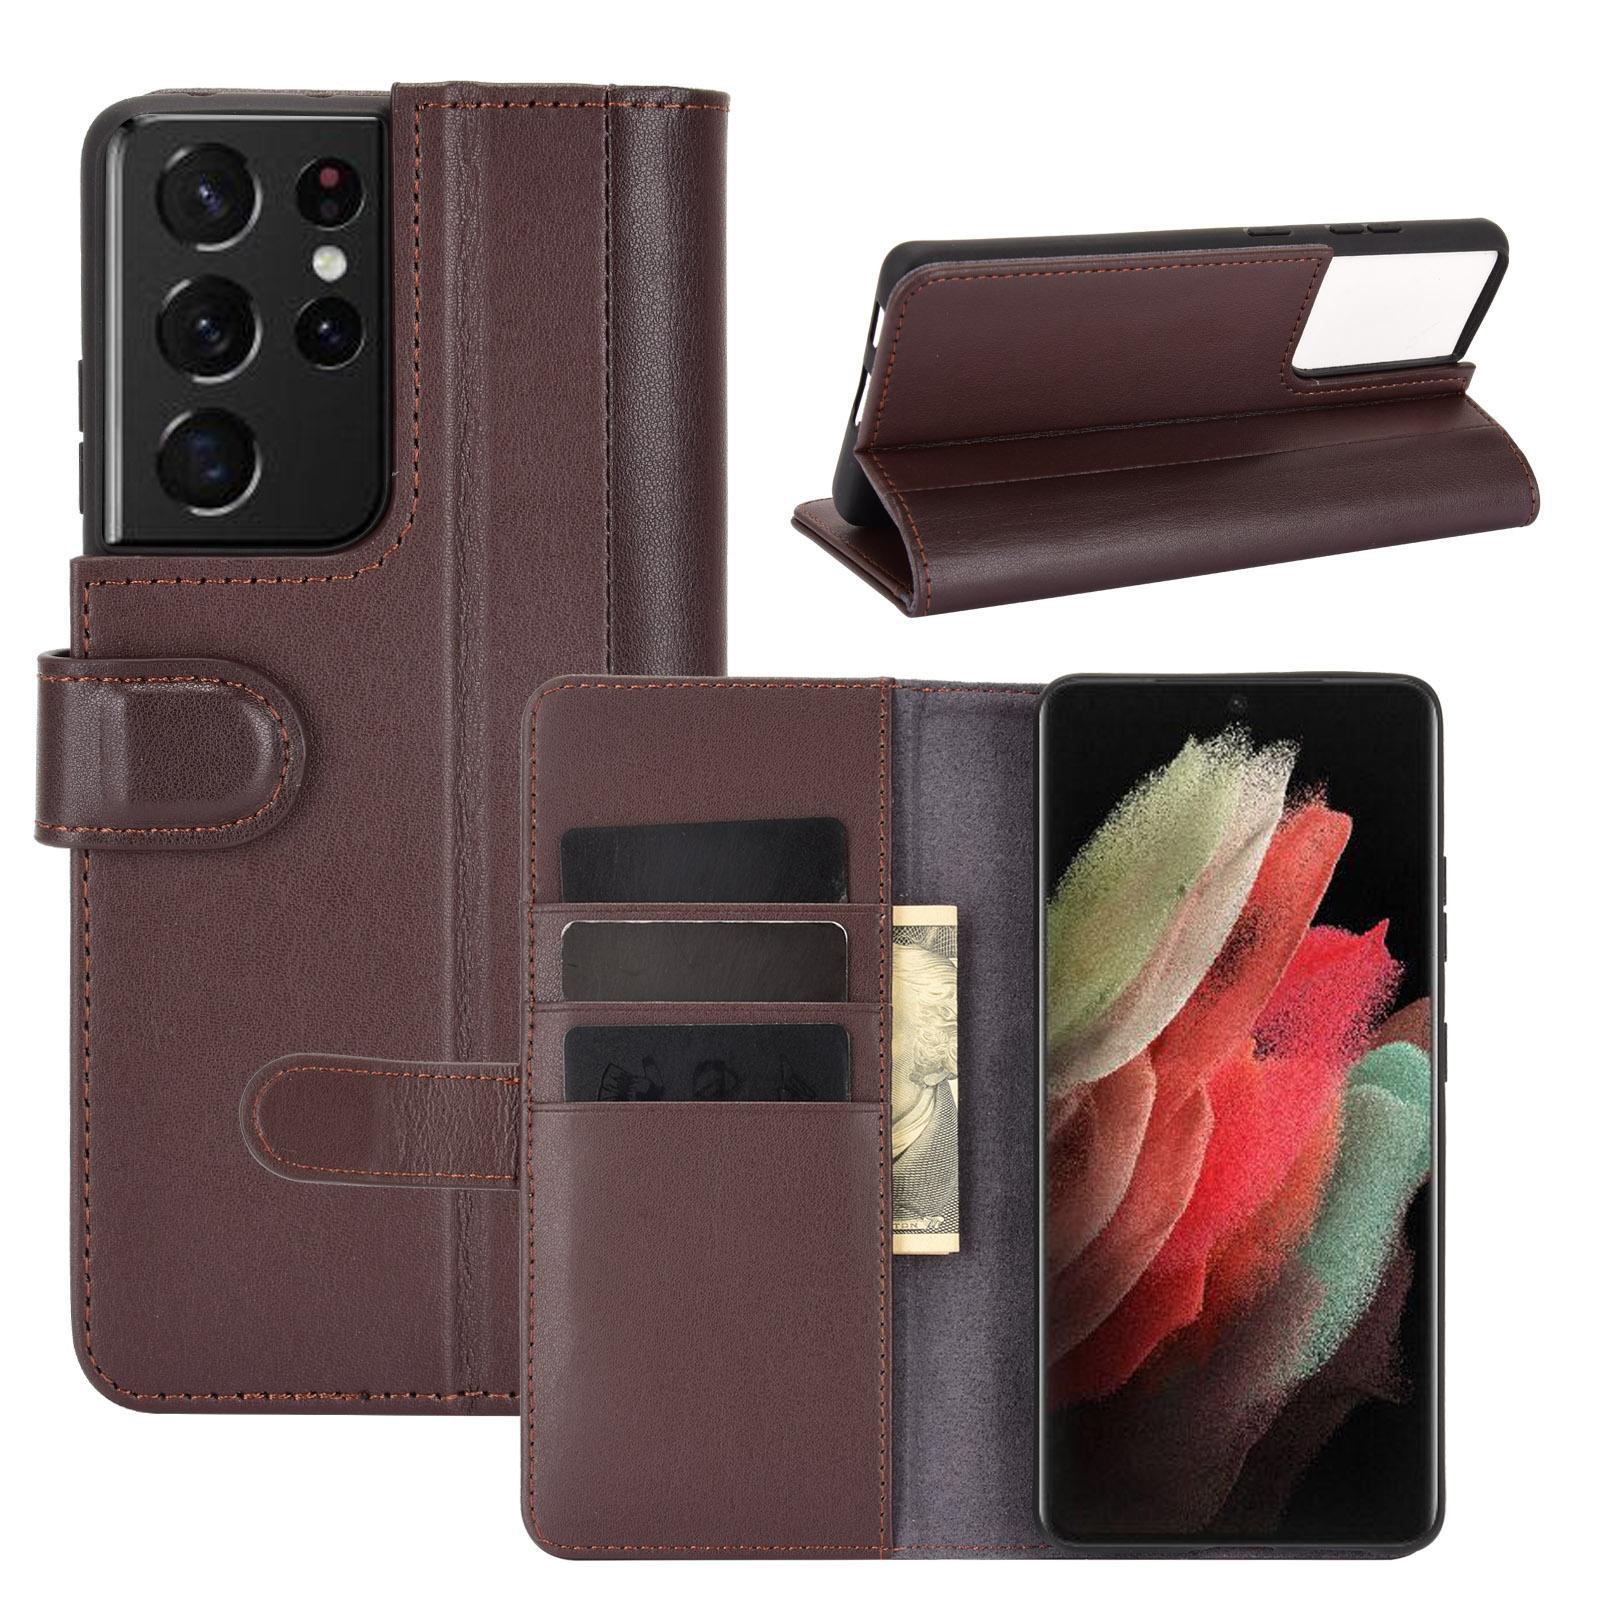 Äkta Läderfodral Samsung Galaxy S21 Ultra brun